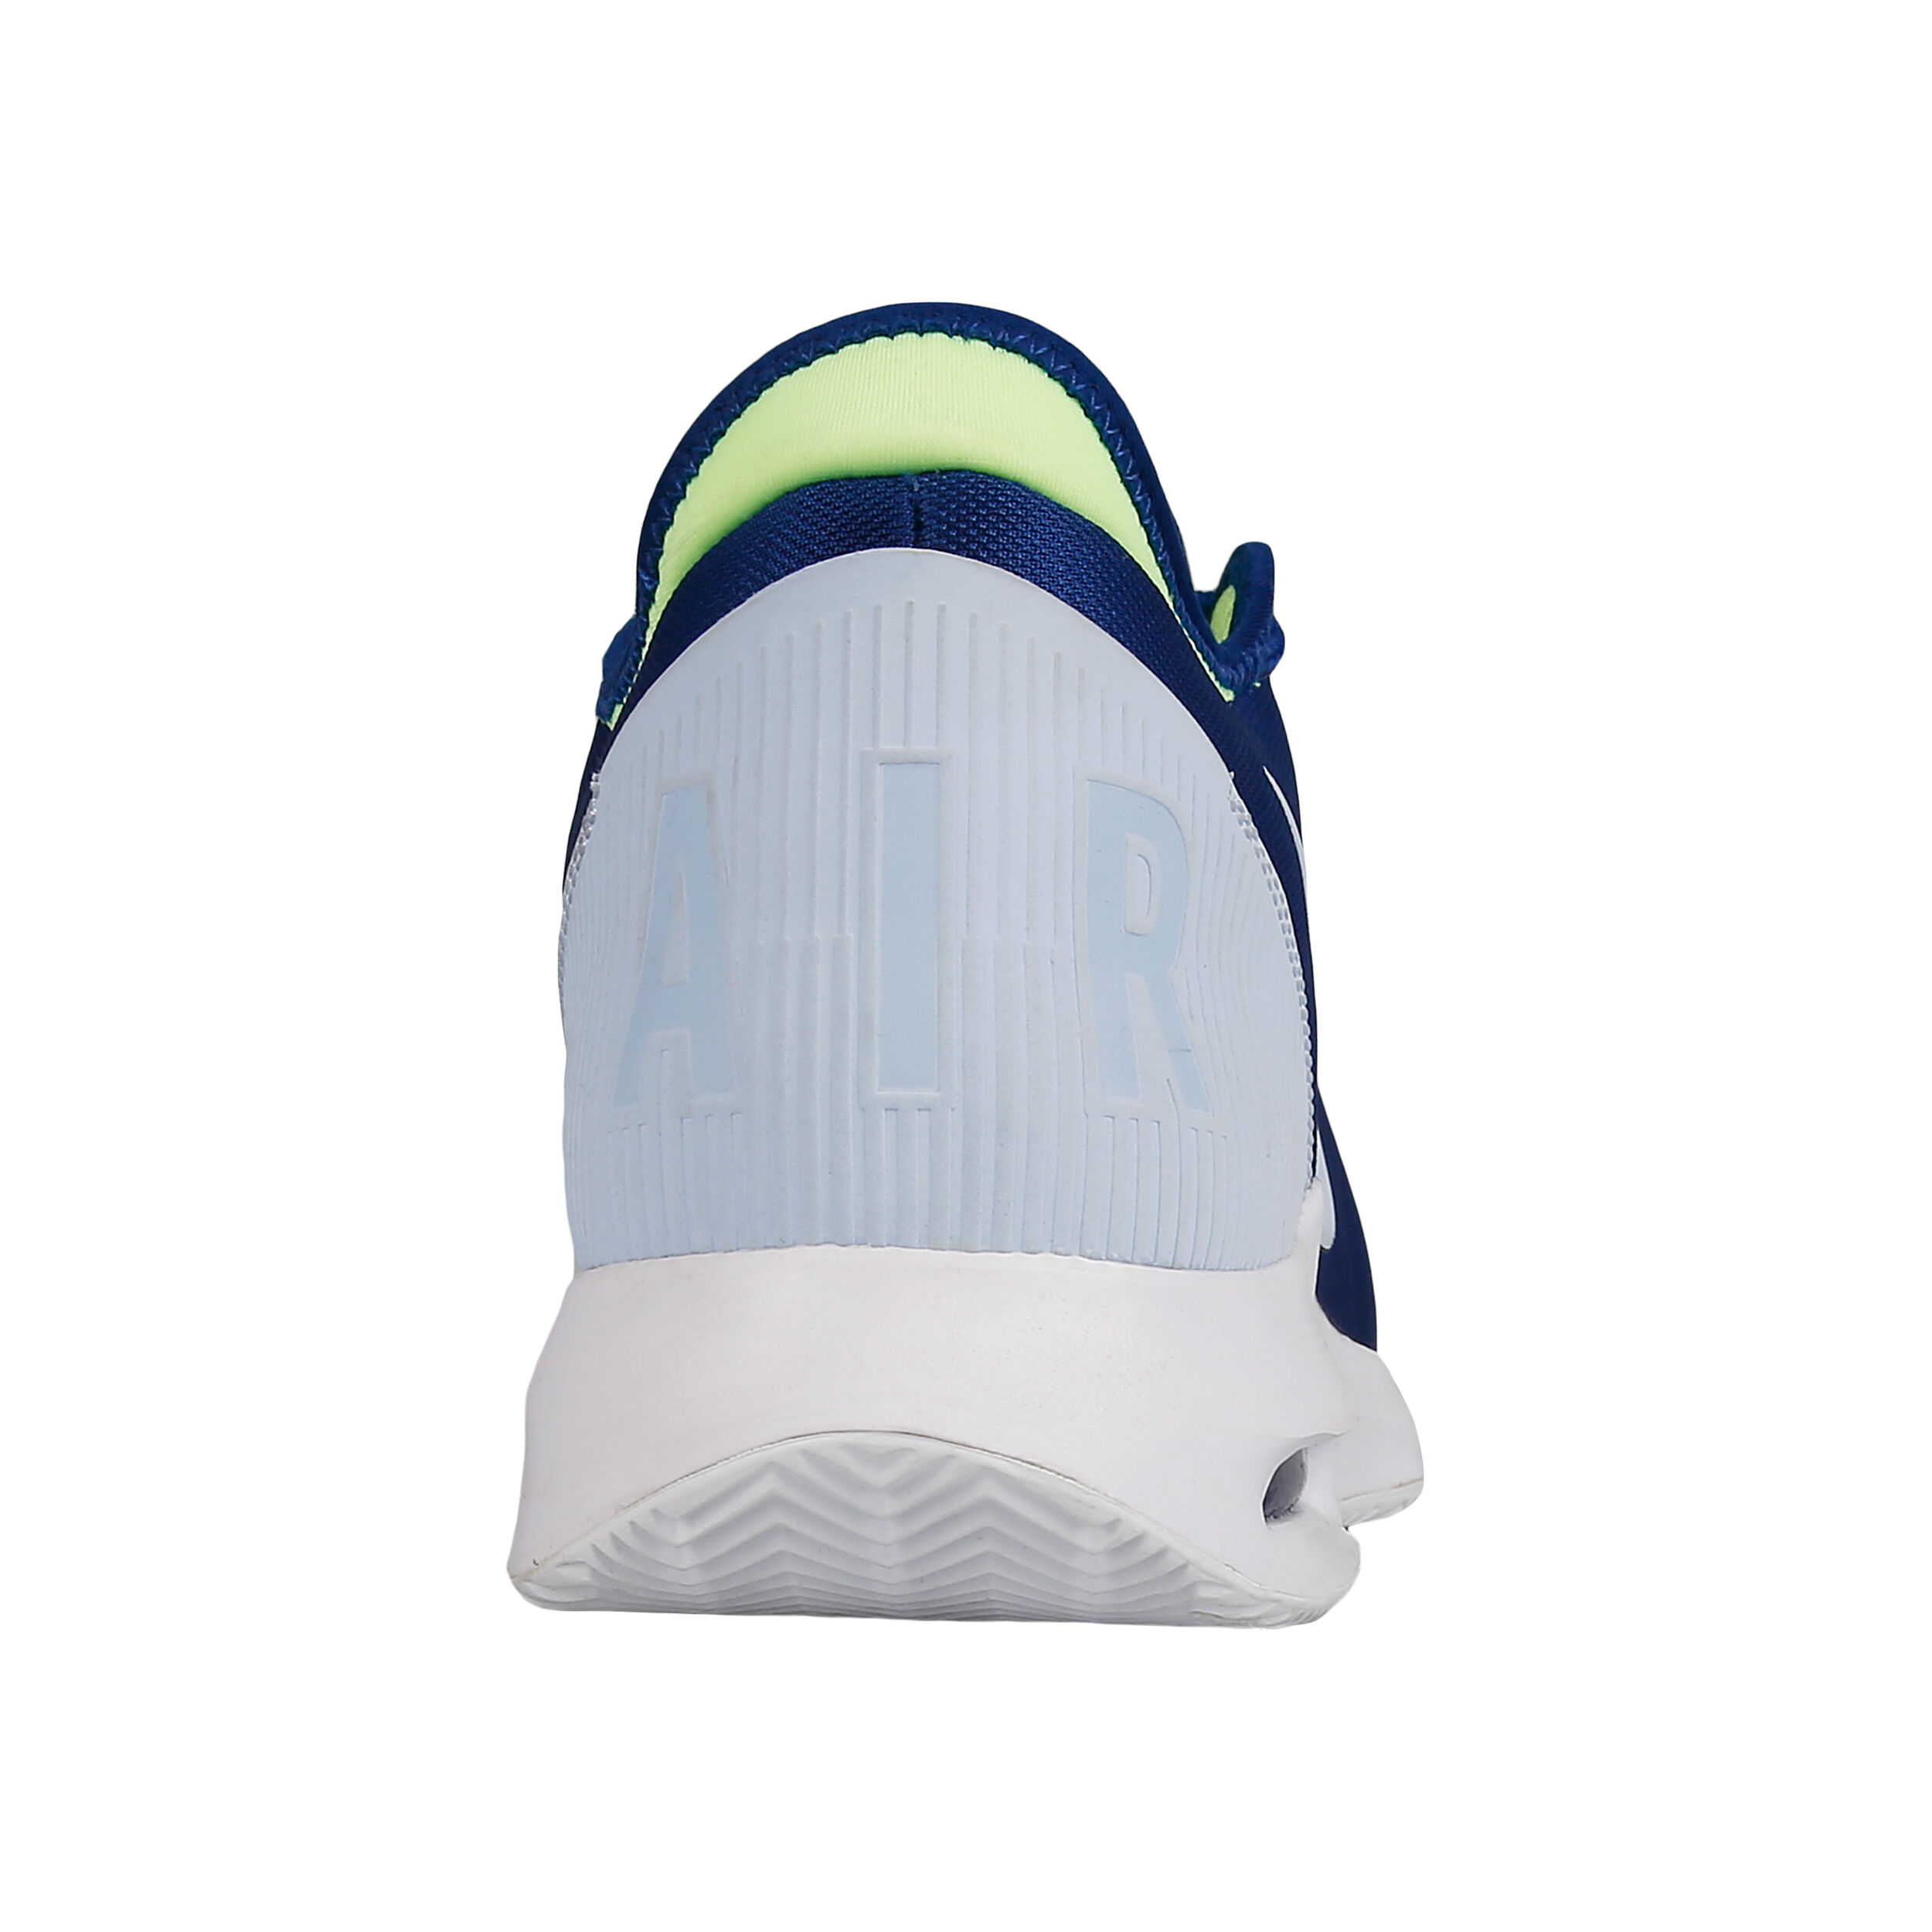 NikeCourt Air Max Wildcard Clay Tennisschuh für Männer. Nike